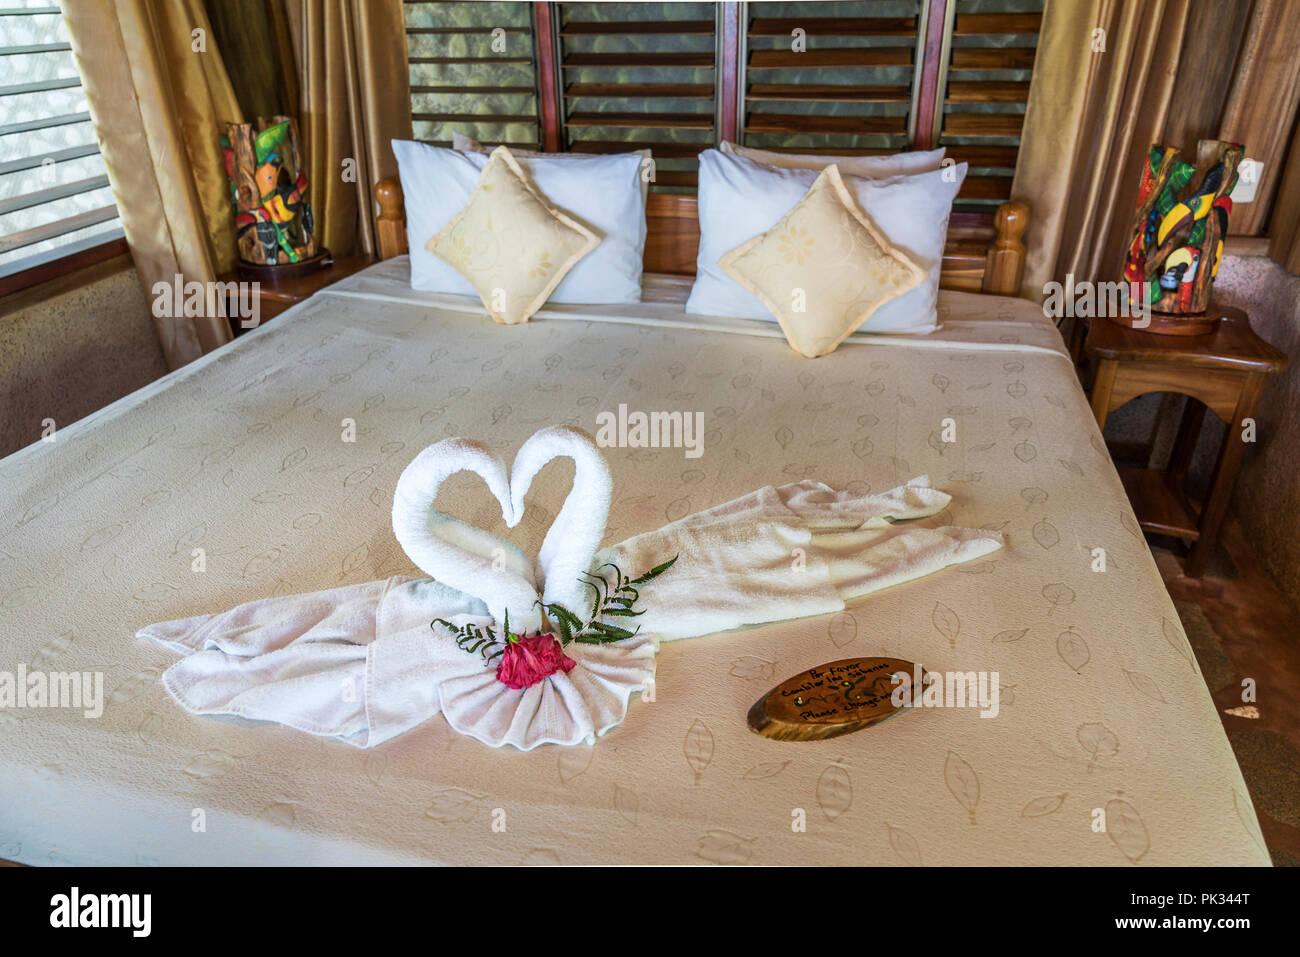 Towel displayed as Swans, LaCusinga Hotel, Costa Rica Stock Photo